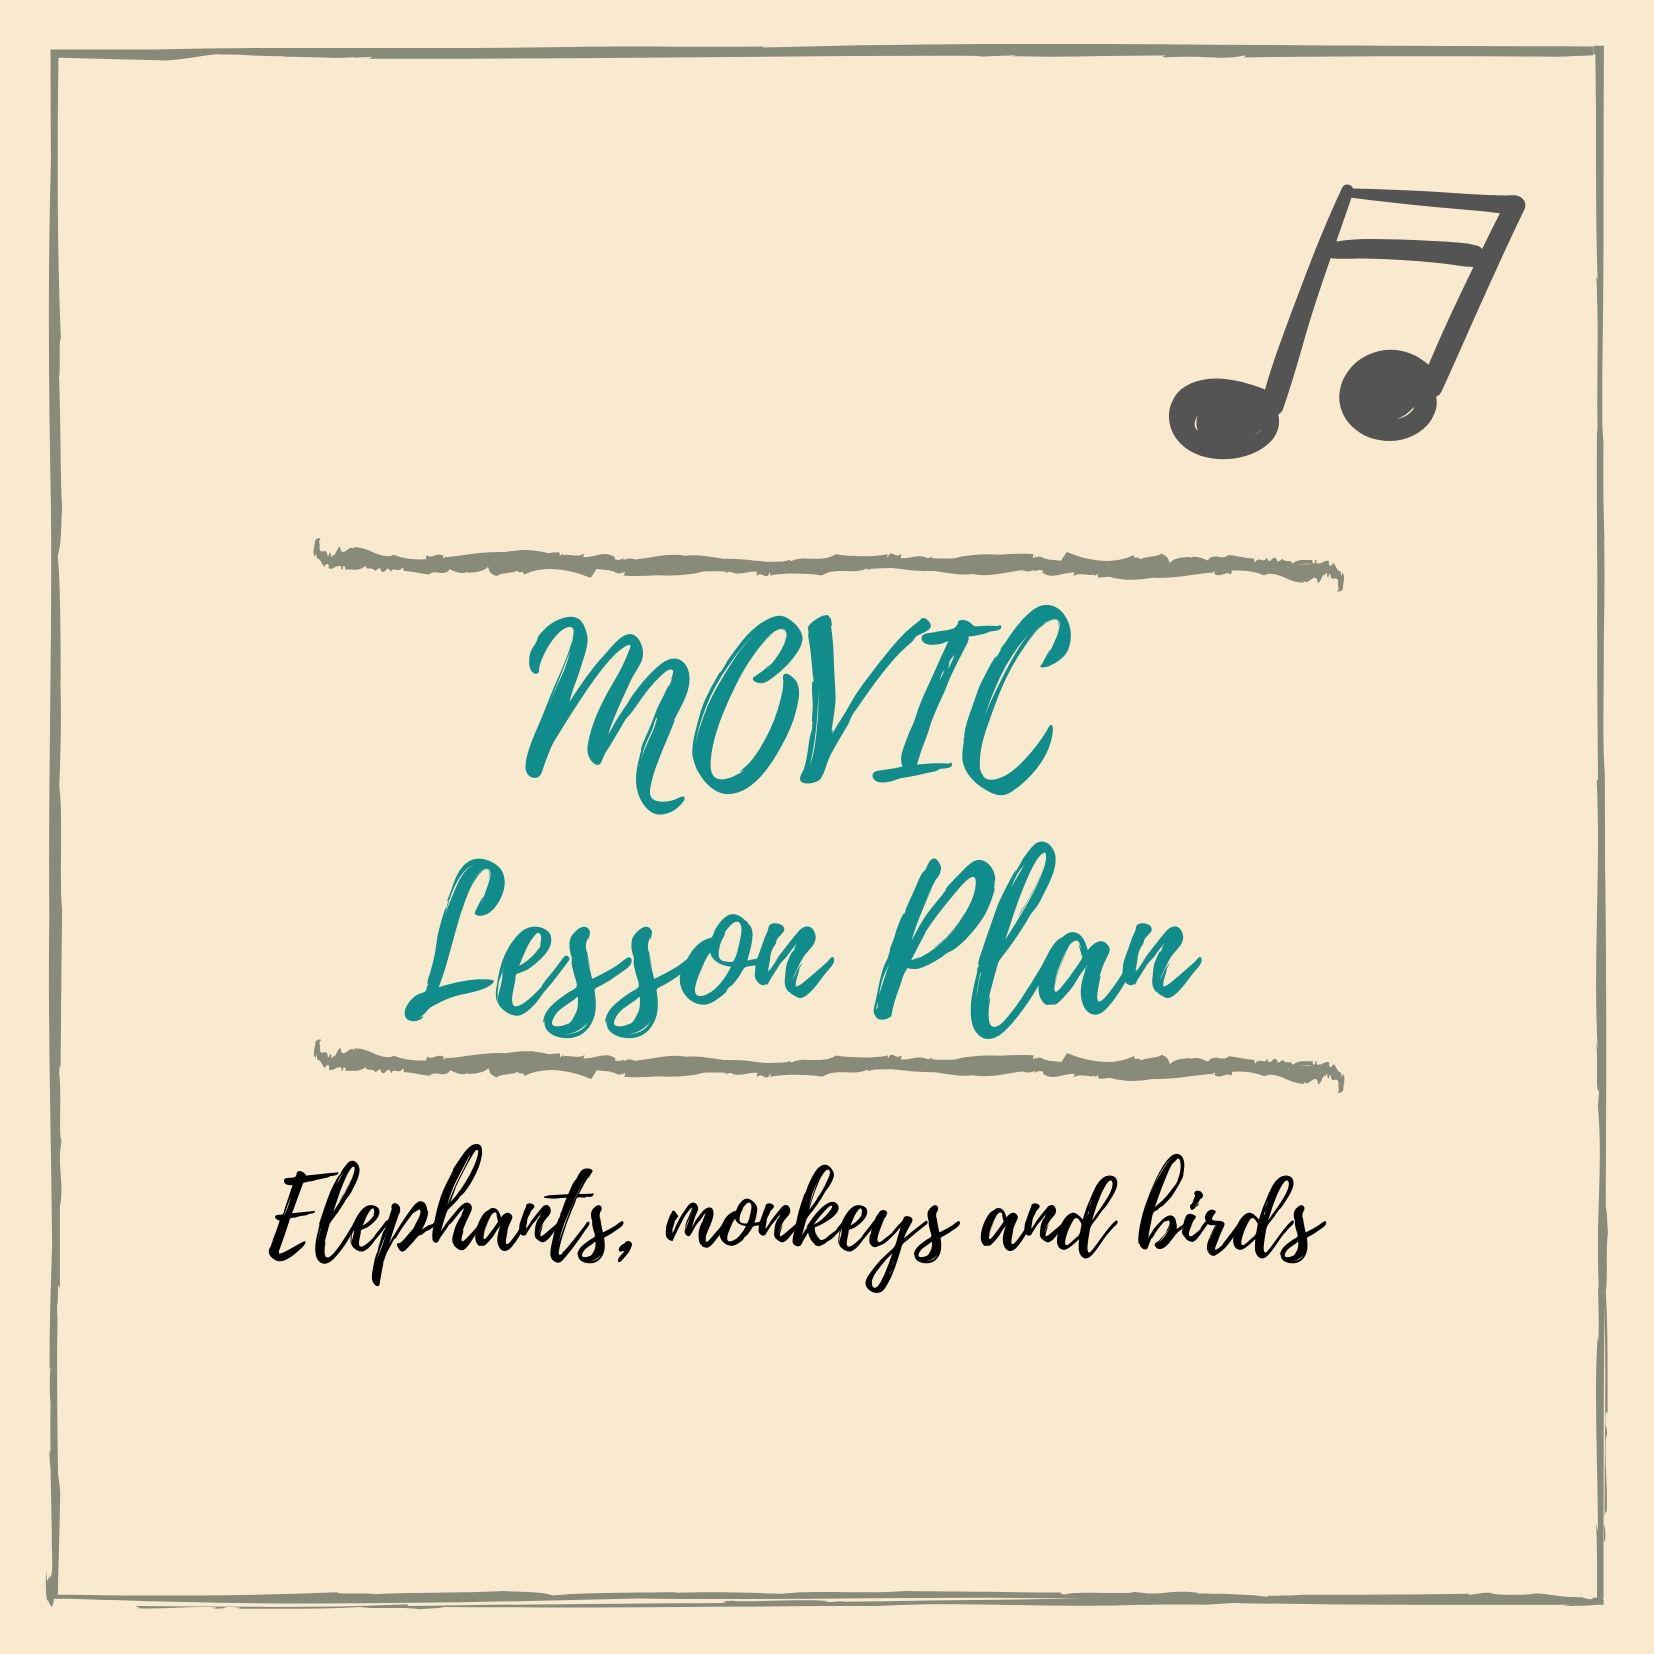 MOVIC lesson plan